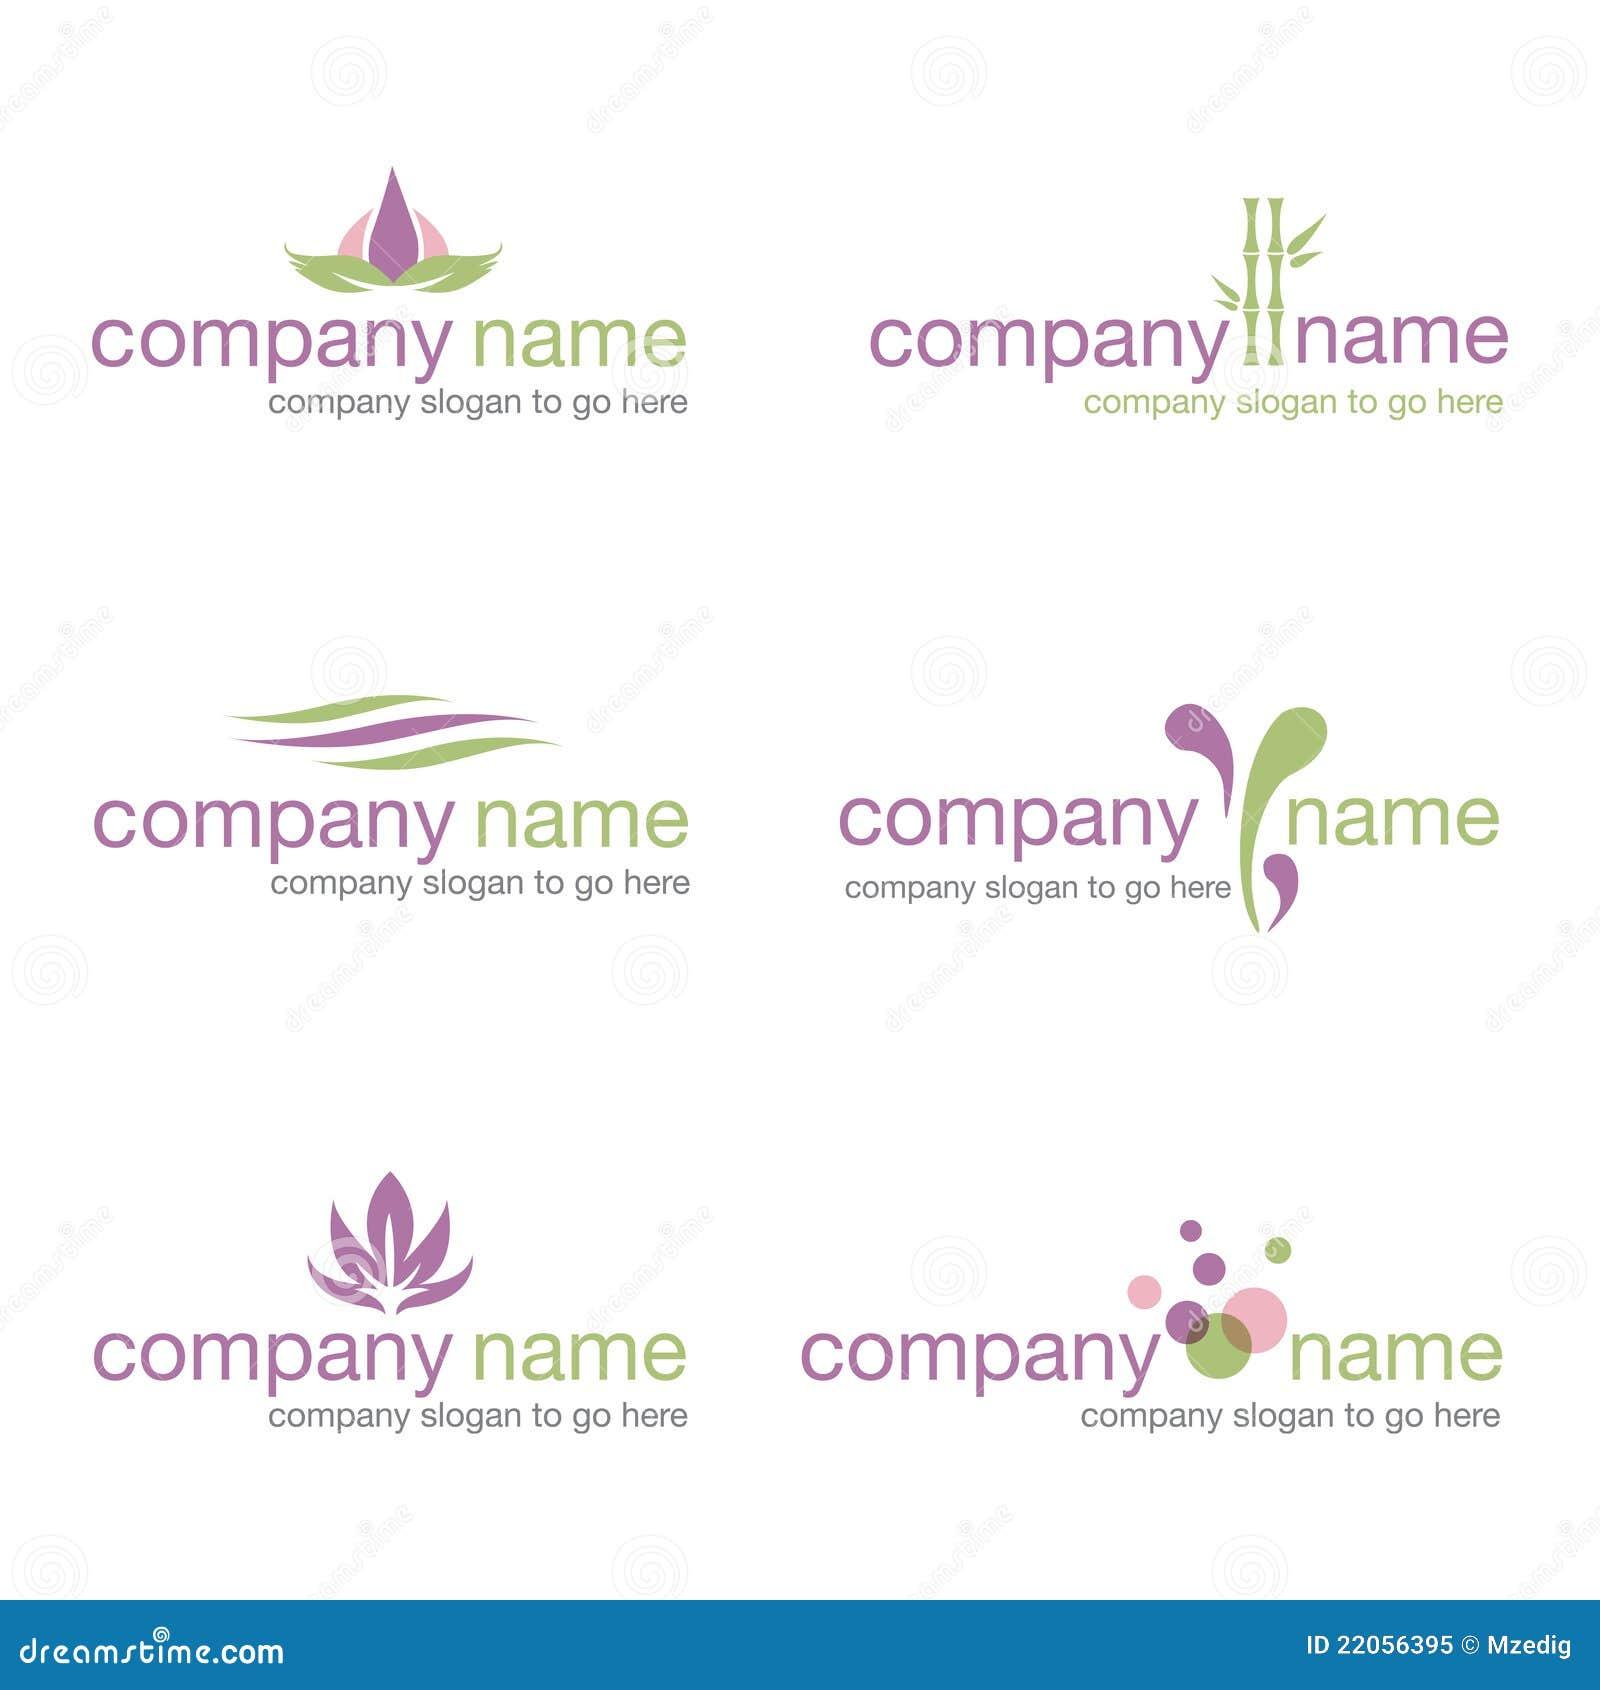 Spa wellness logo  Set Of Six Spa And Wellness Logos (vector) Royalty Free Stock ...